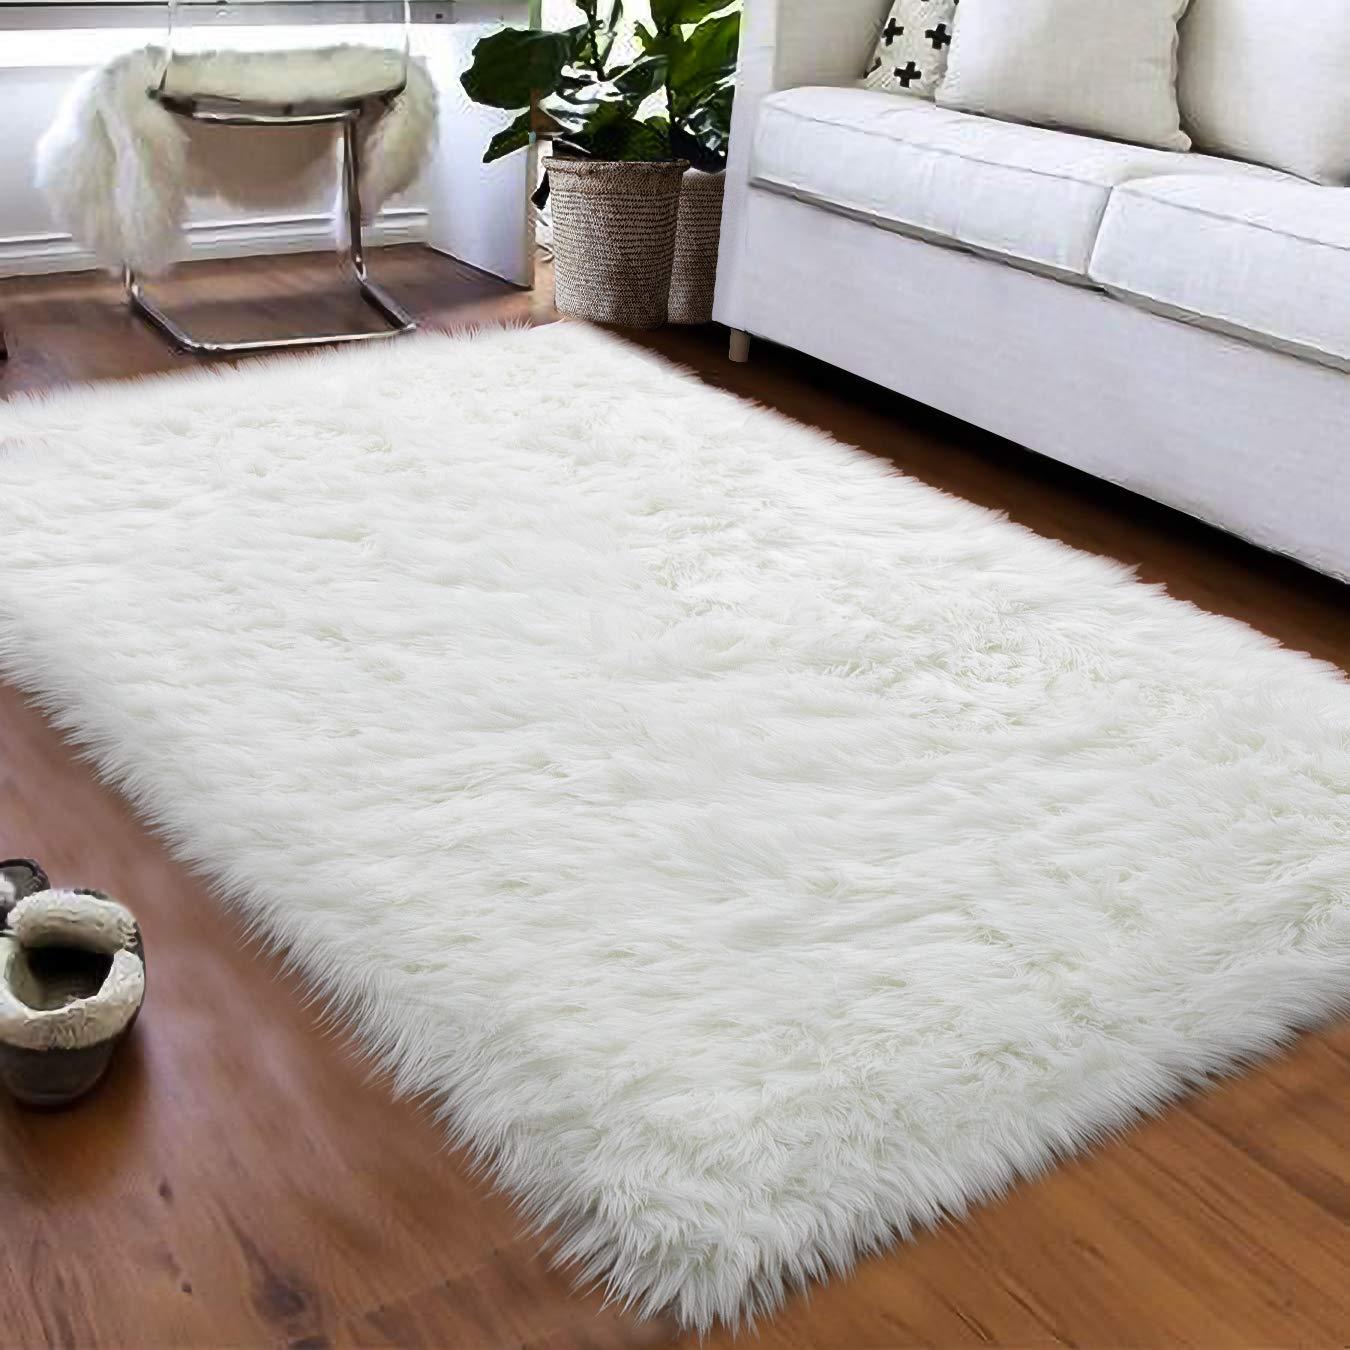 Softlife Faux Fur Sheepskin Area Rug Shaggy Wool Carpet for Bedroom Girls Living Room Home Decor 3ft x 5ft, White